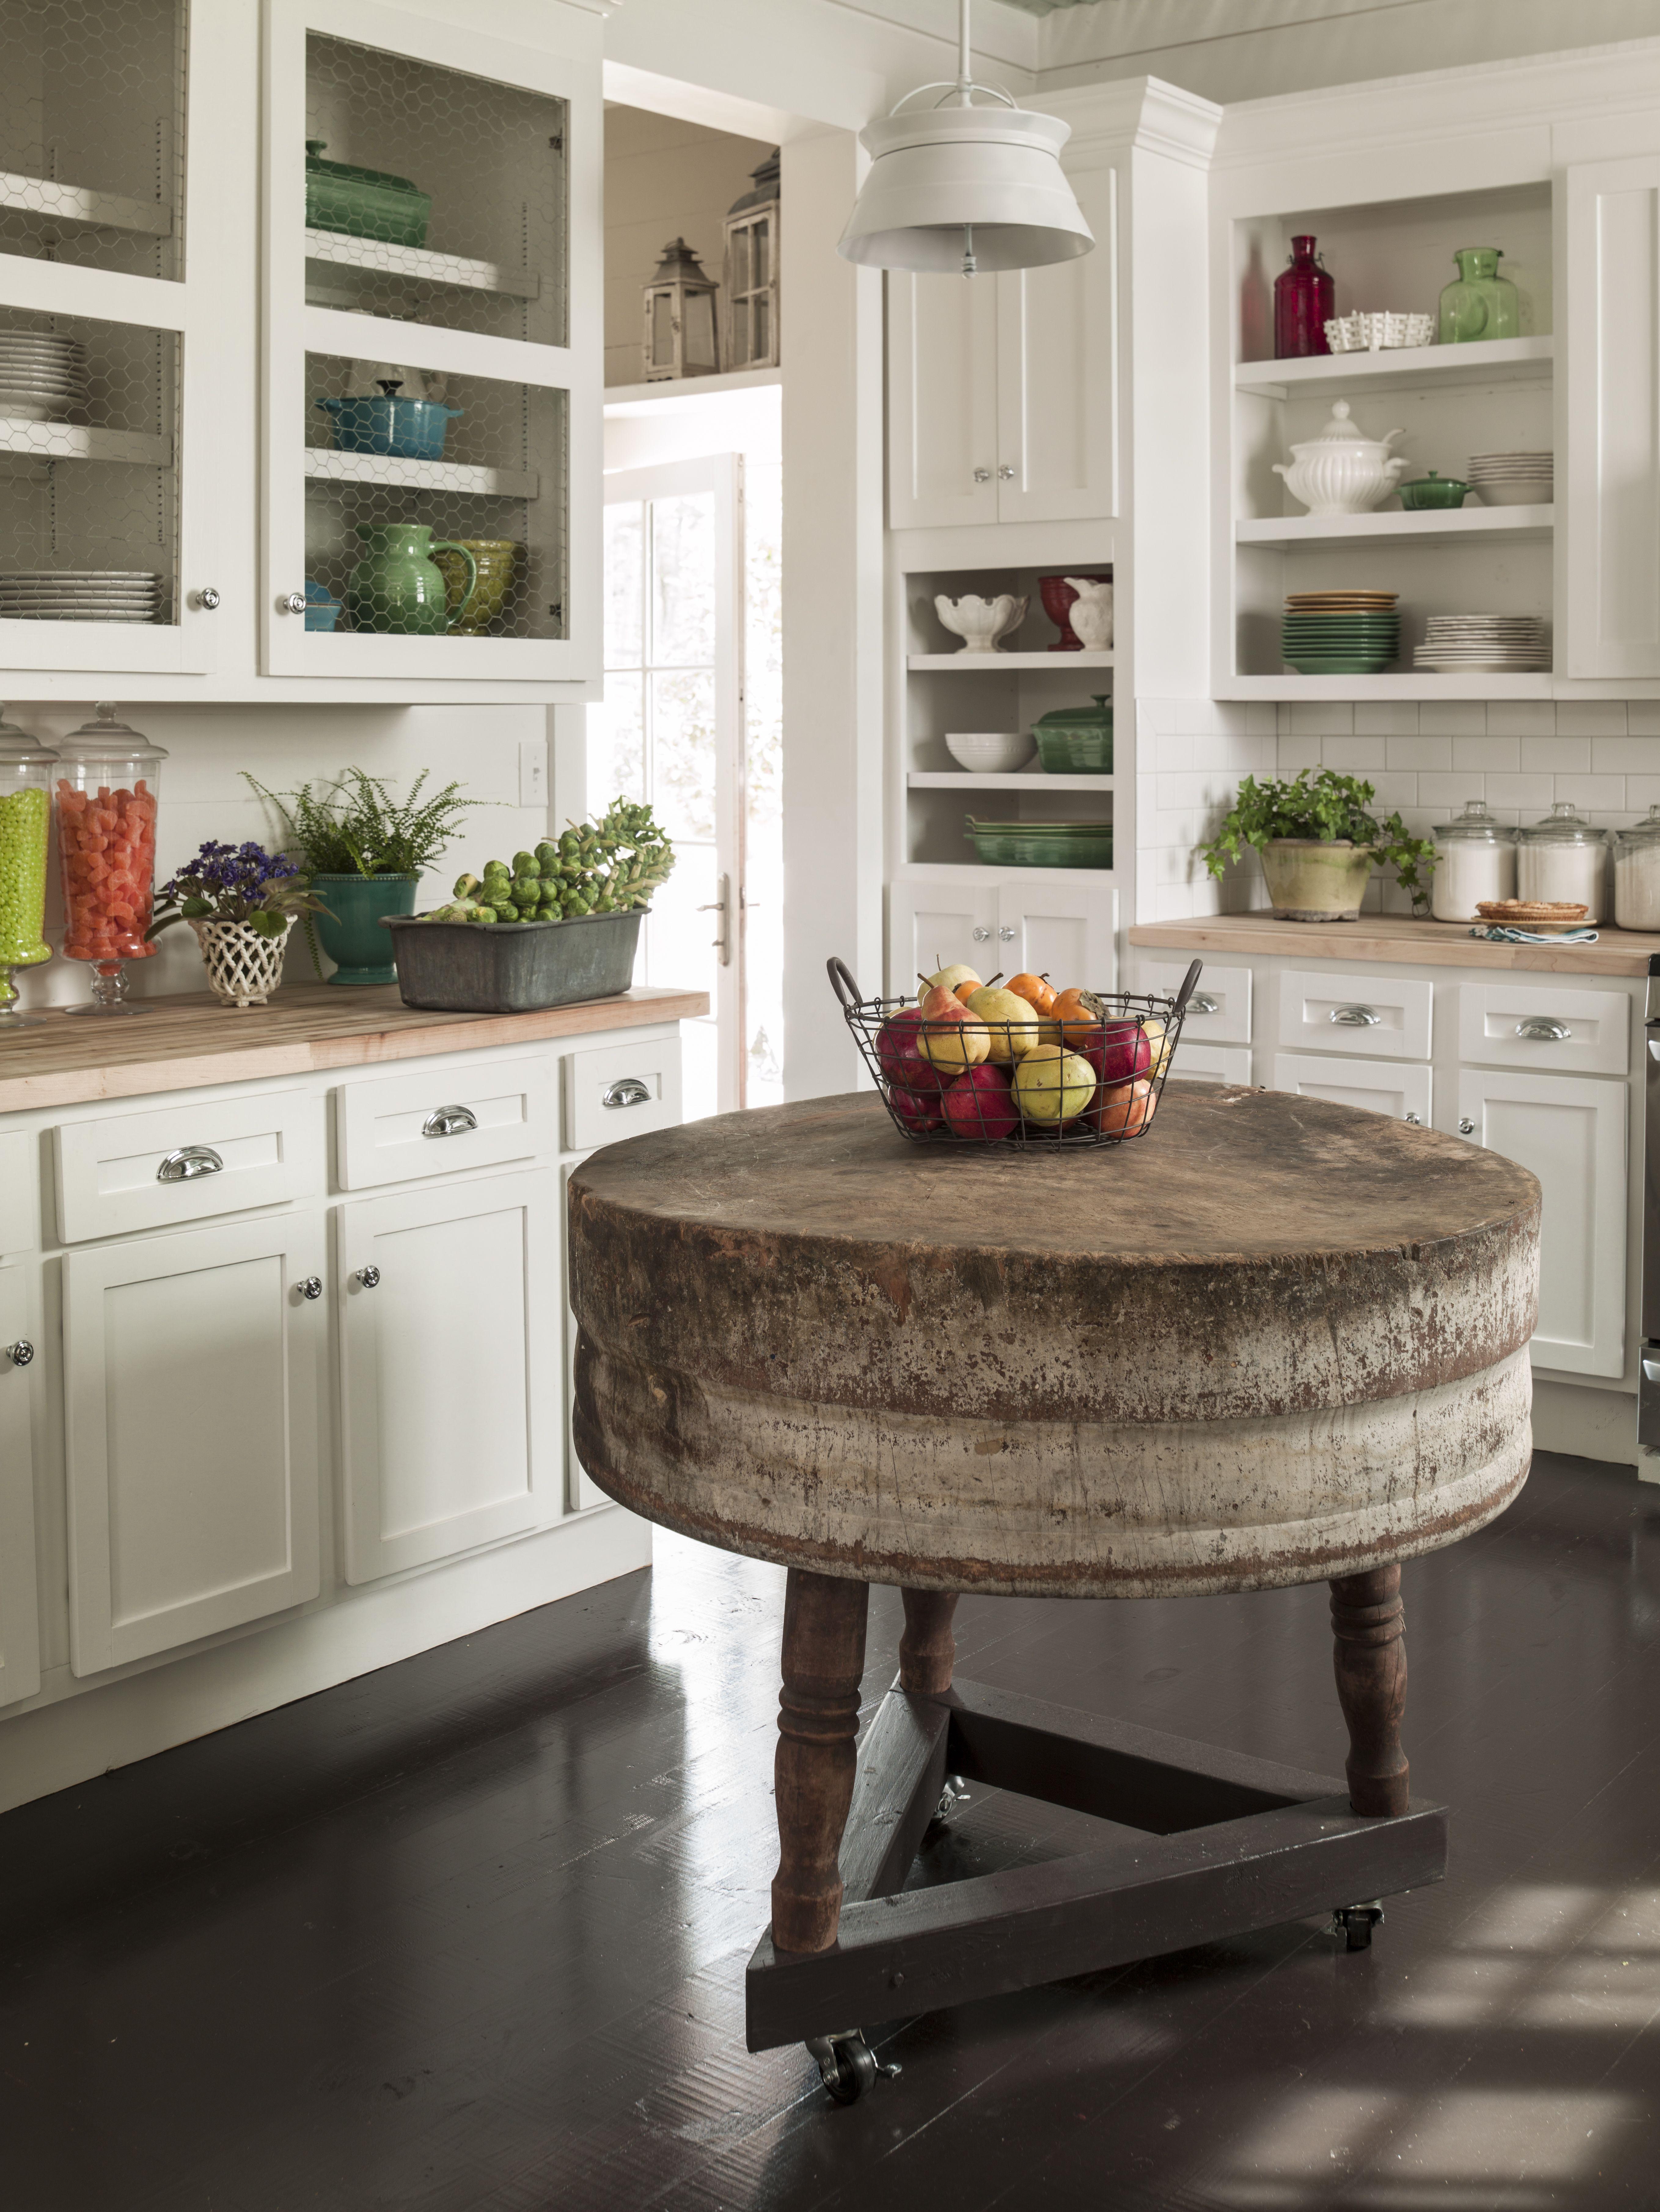 Mobile kitchen island for extra workspace kitchen pinterest